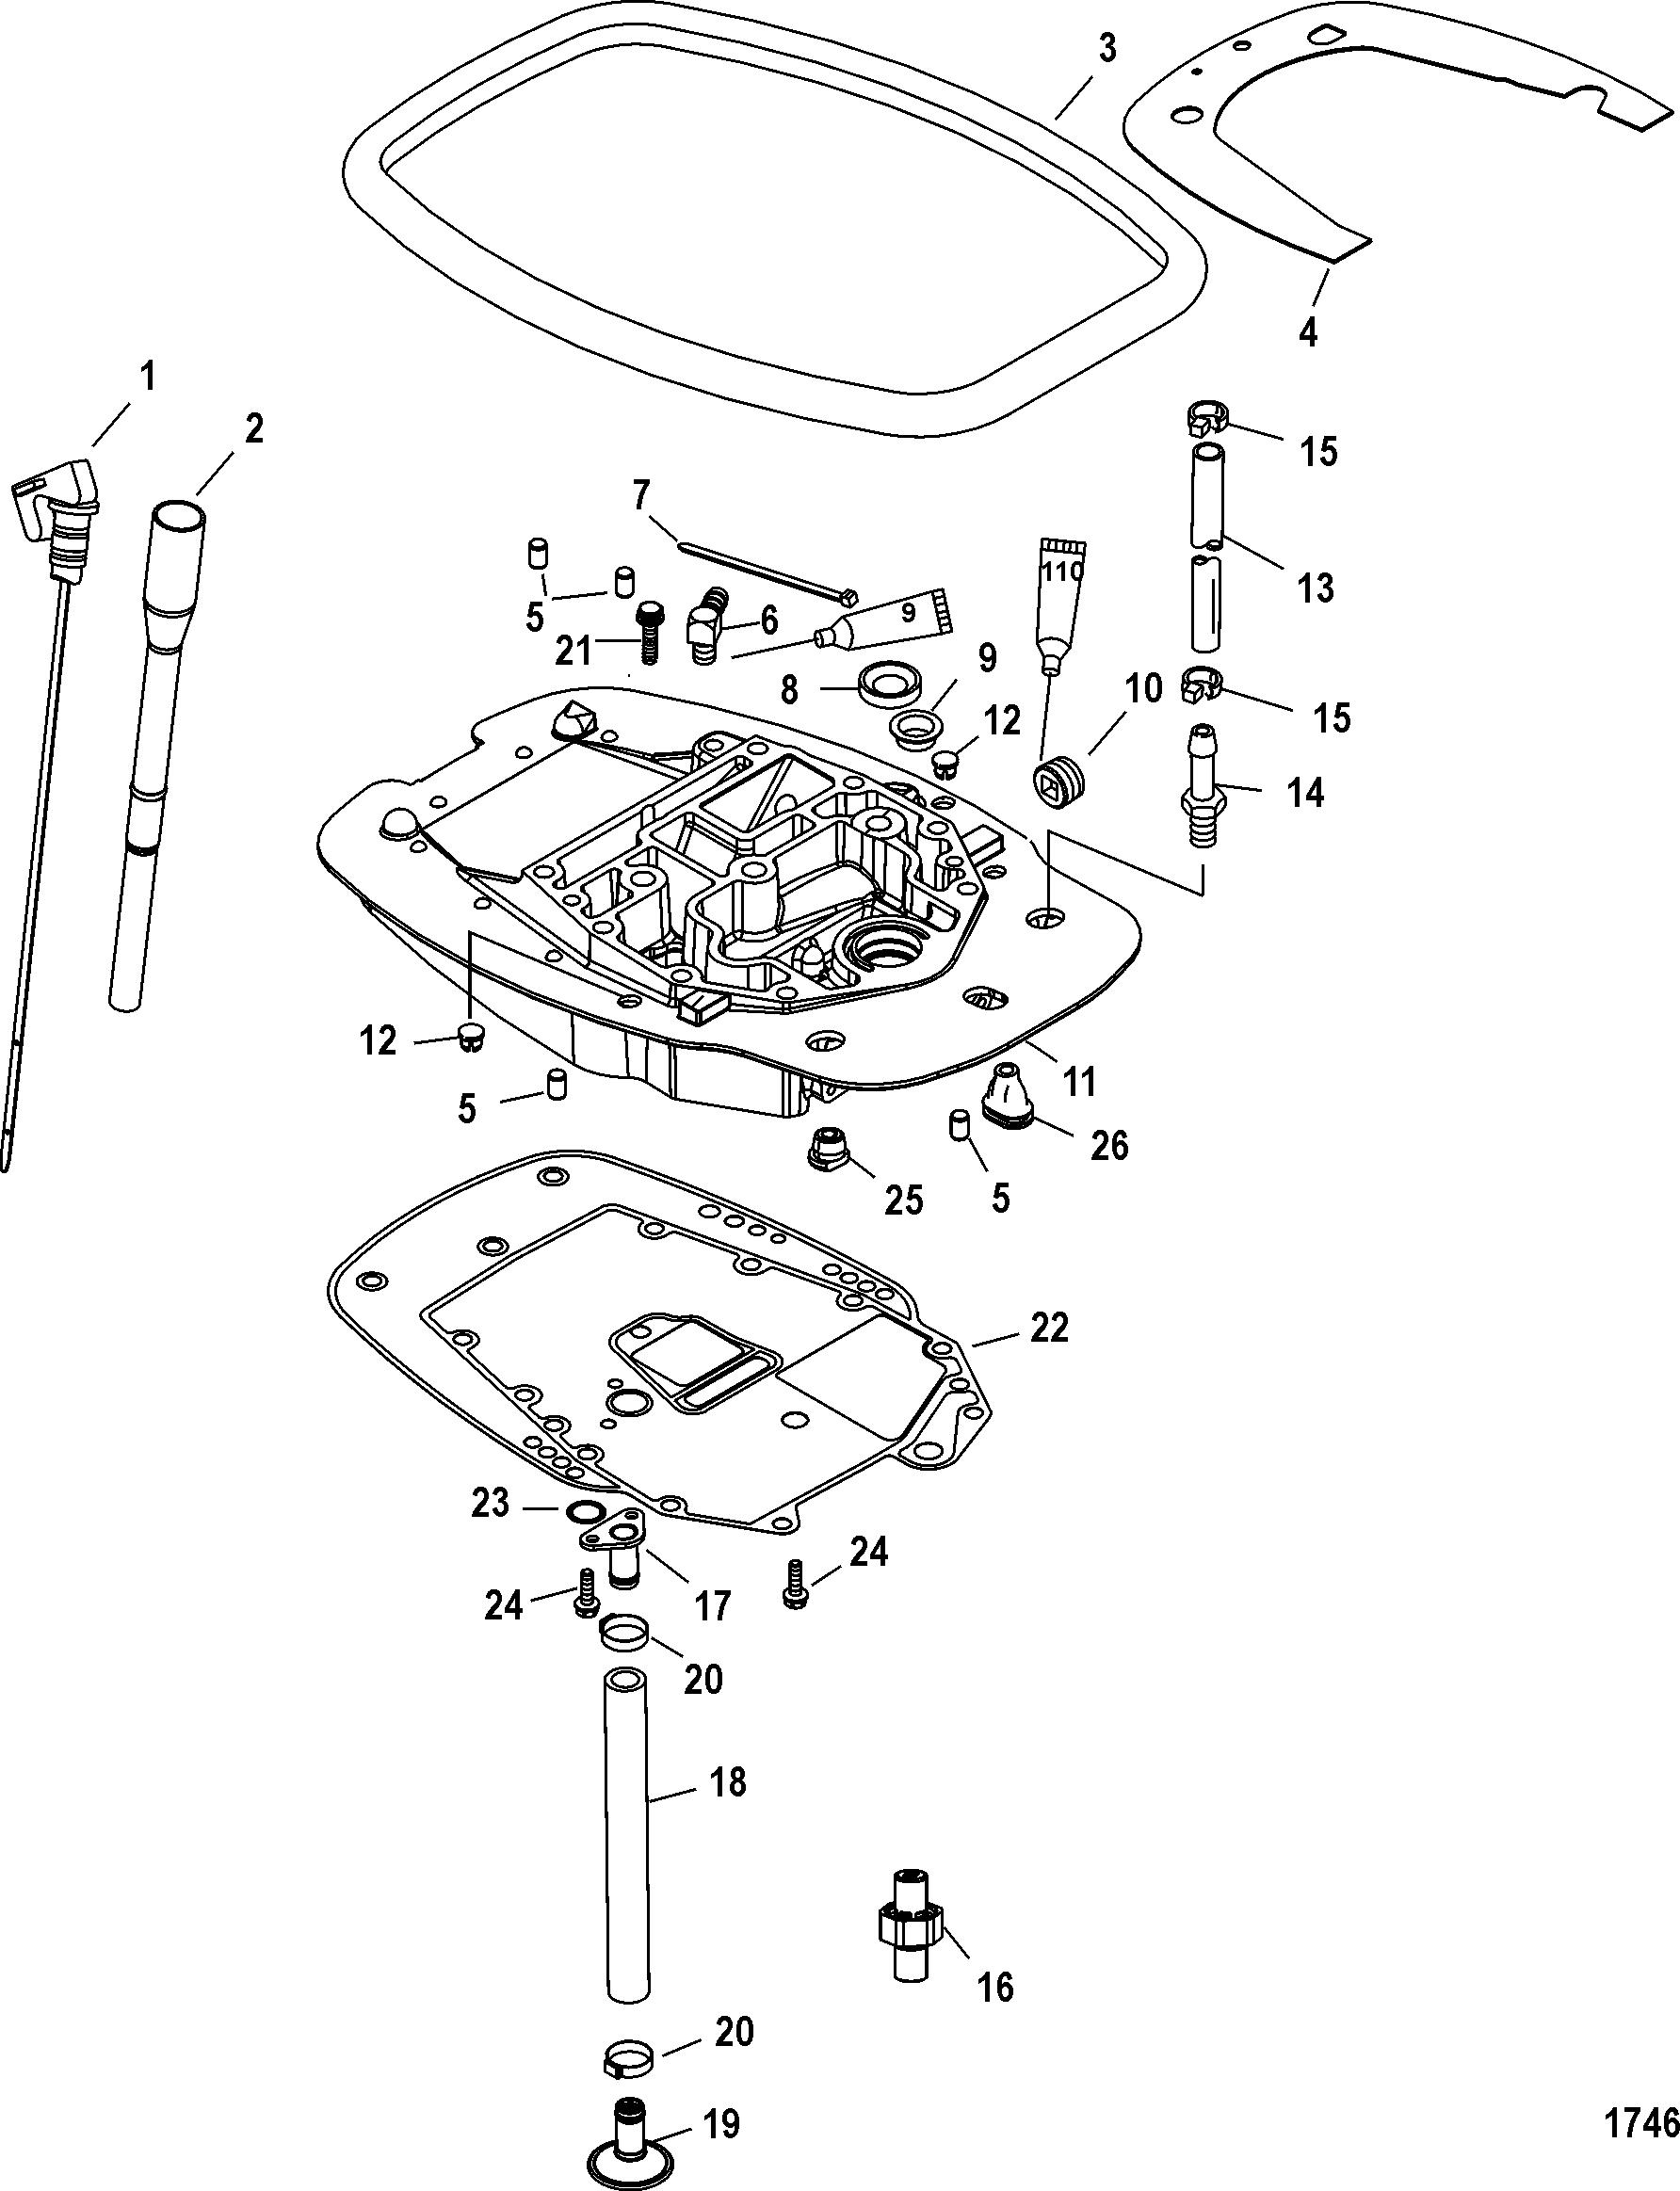 Adaptor Plate For Mariner Mercury 40 Efi 3 Cylinder 4 Stroke